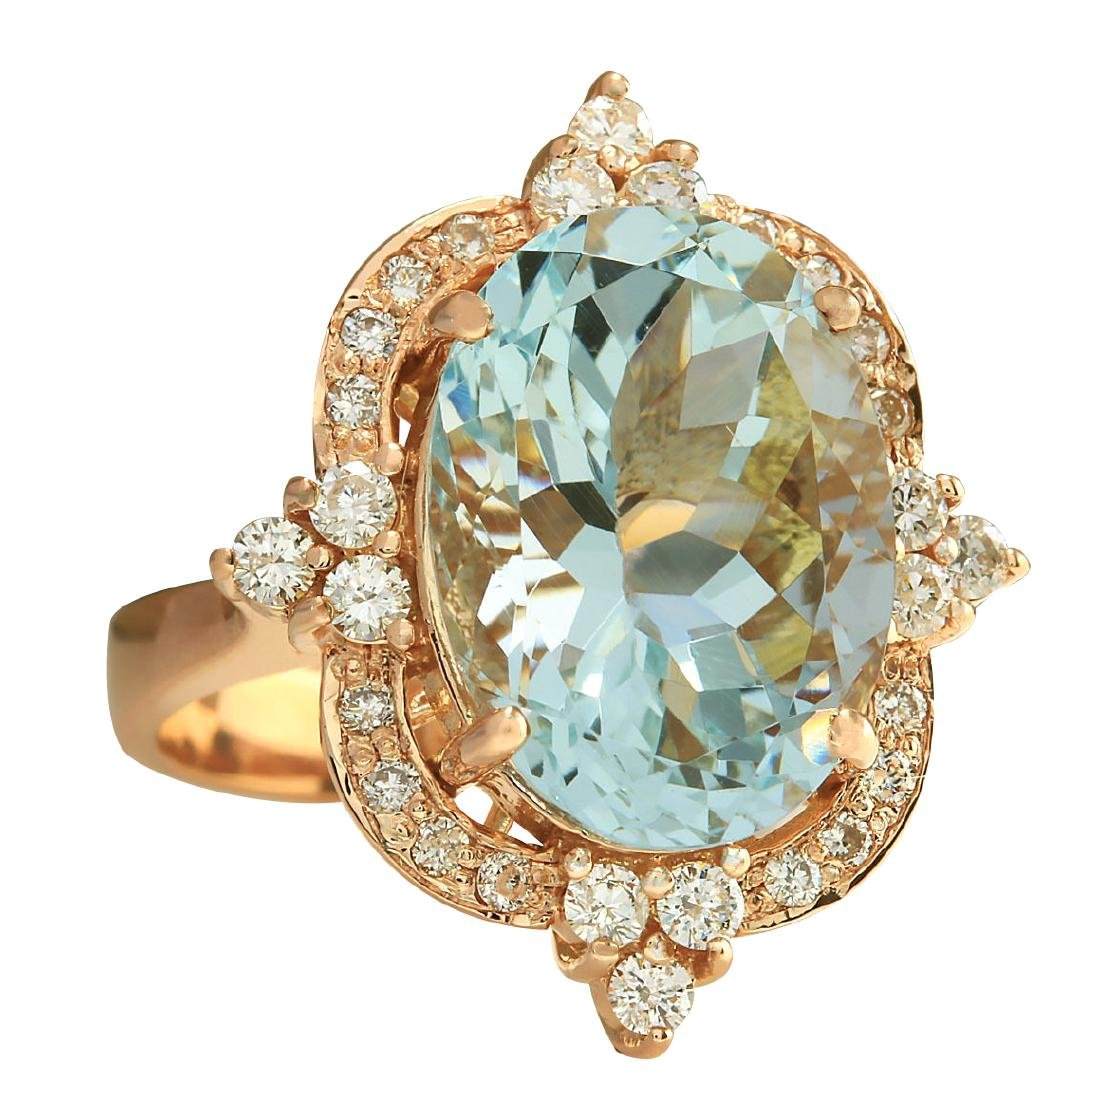 8.27CTW Natural Aquamarine And Diamond Ring In 18K Rose - 2